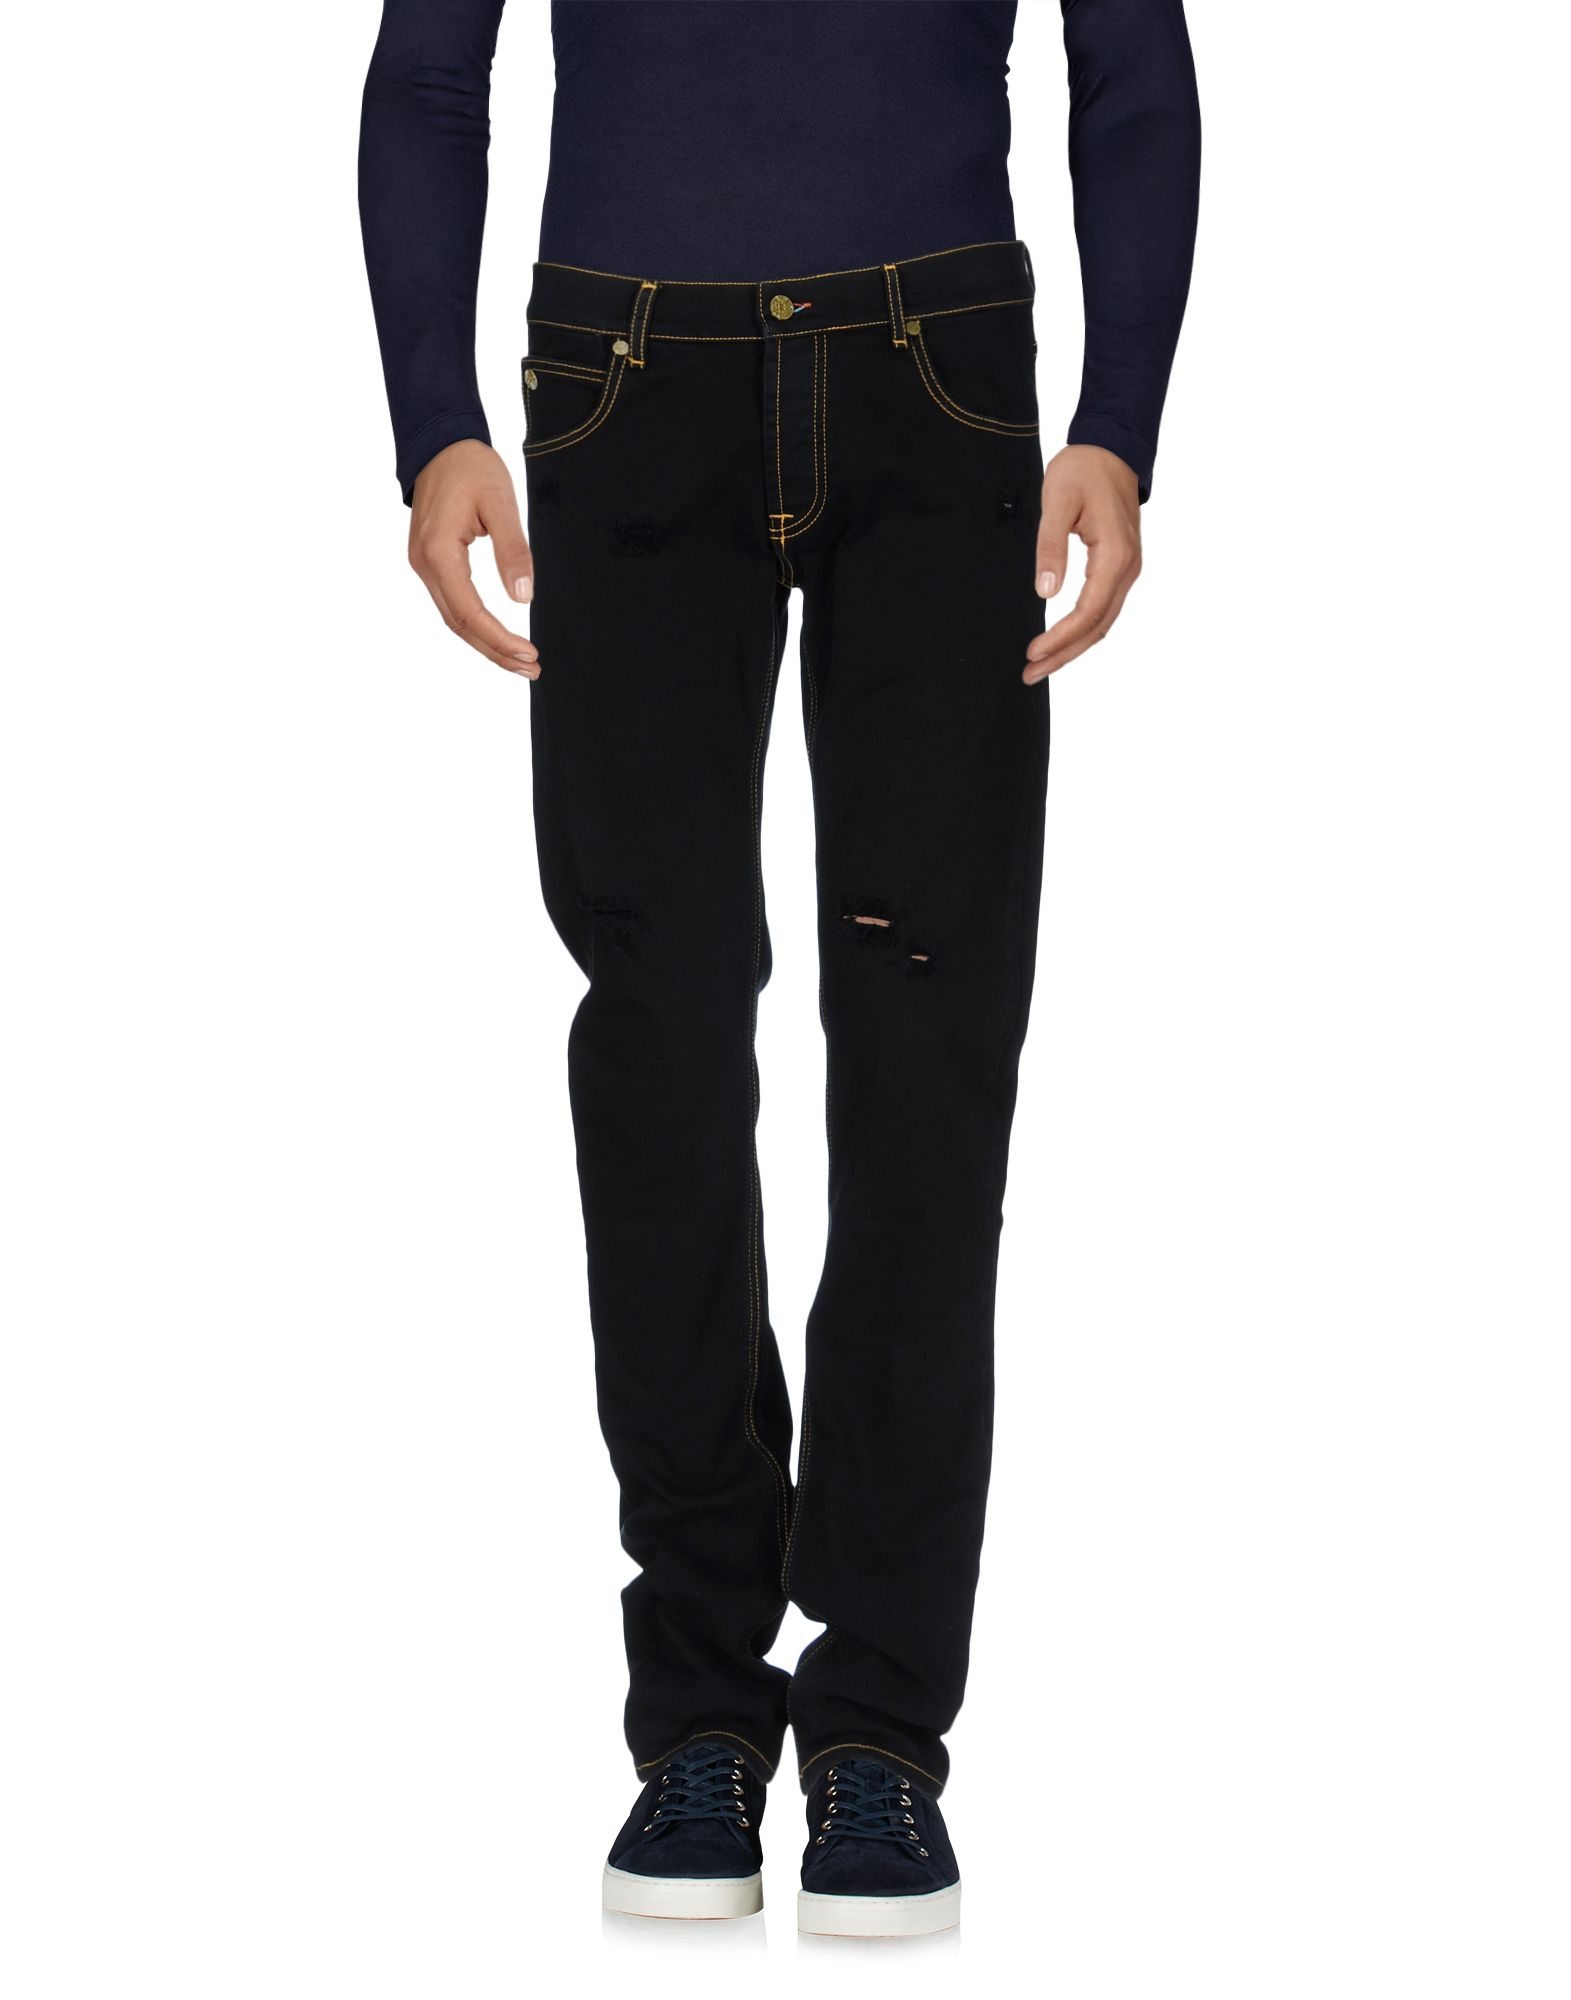 Pantaloni Jeans Maison Clochard Uomo - Acquista online su